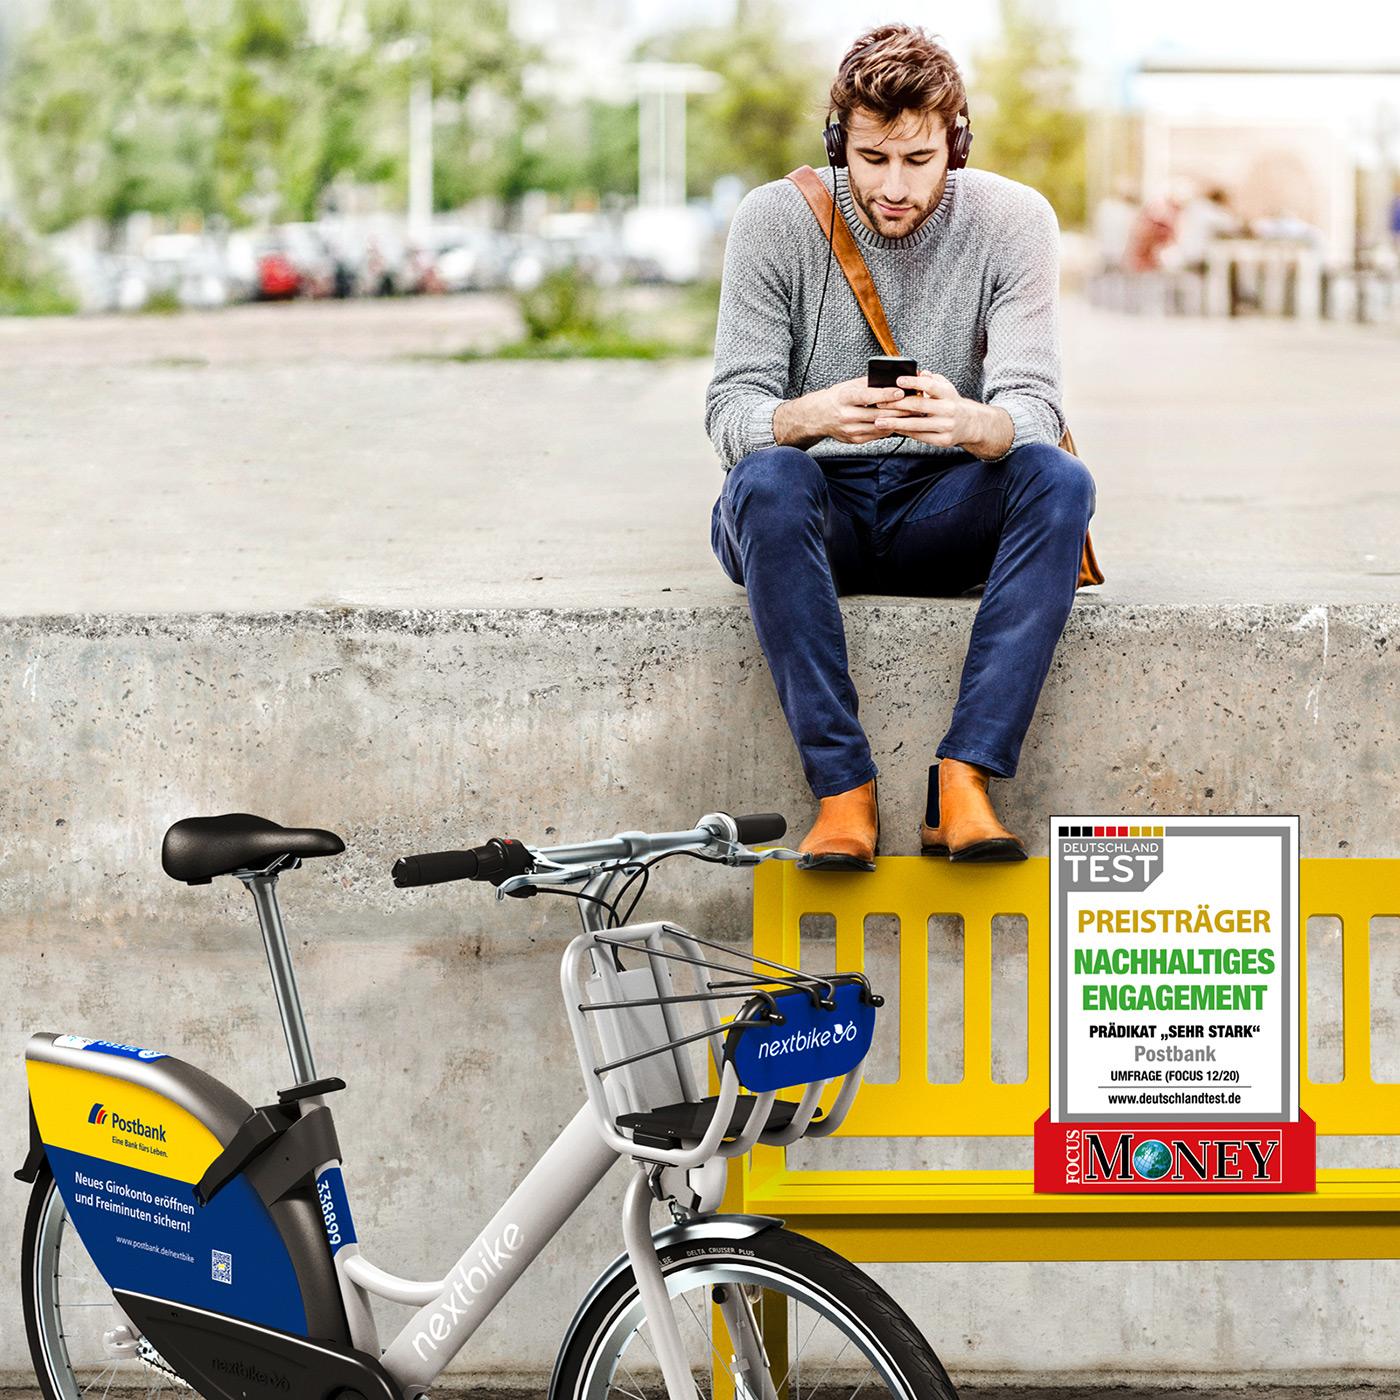 nextbike Postbank Kampagne